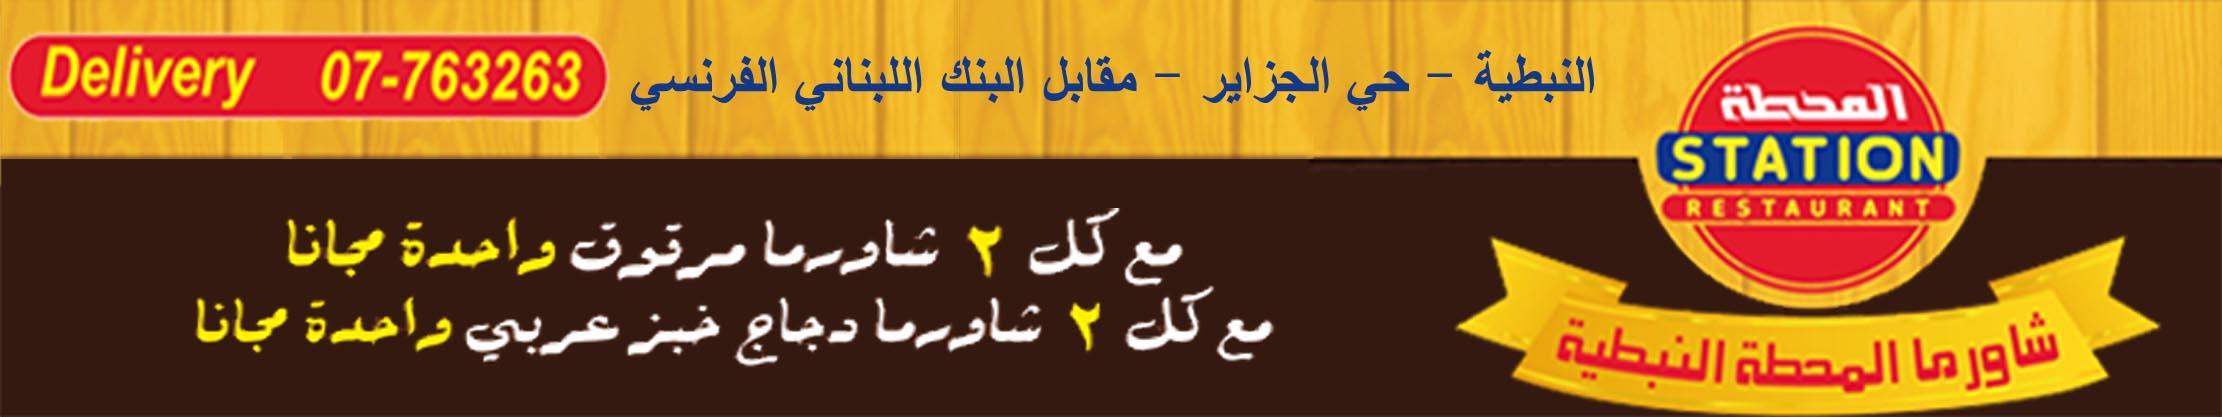 nabatieh.org/newsh.php?go=fullnews&newsid=8781